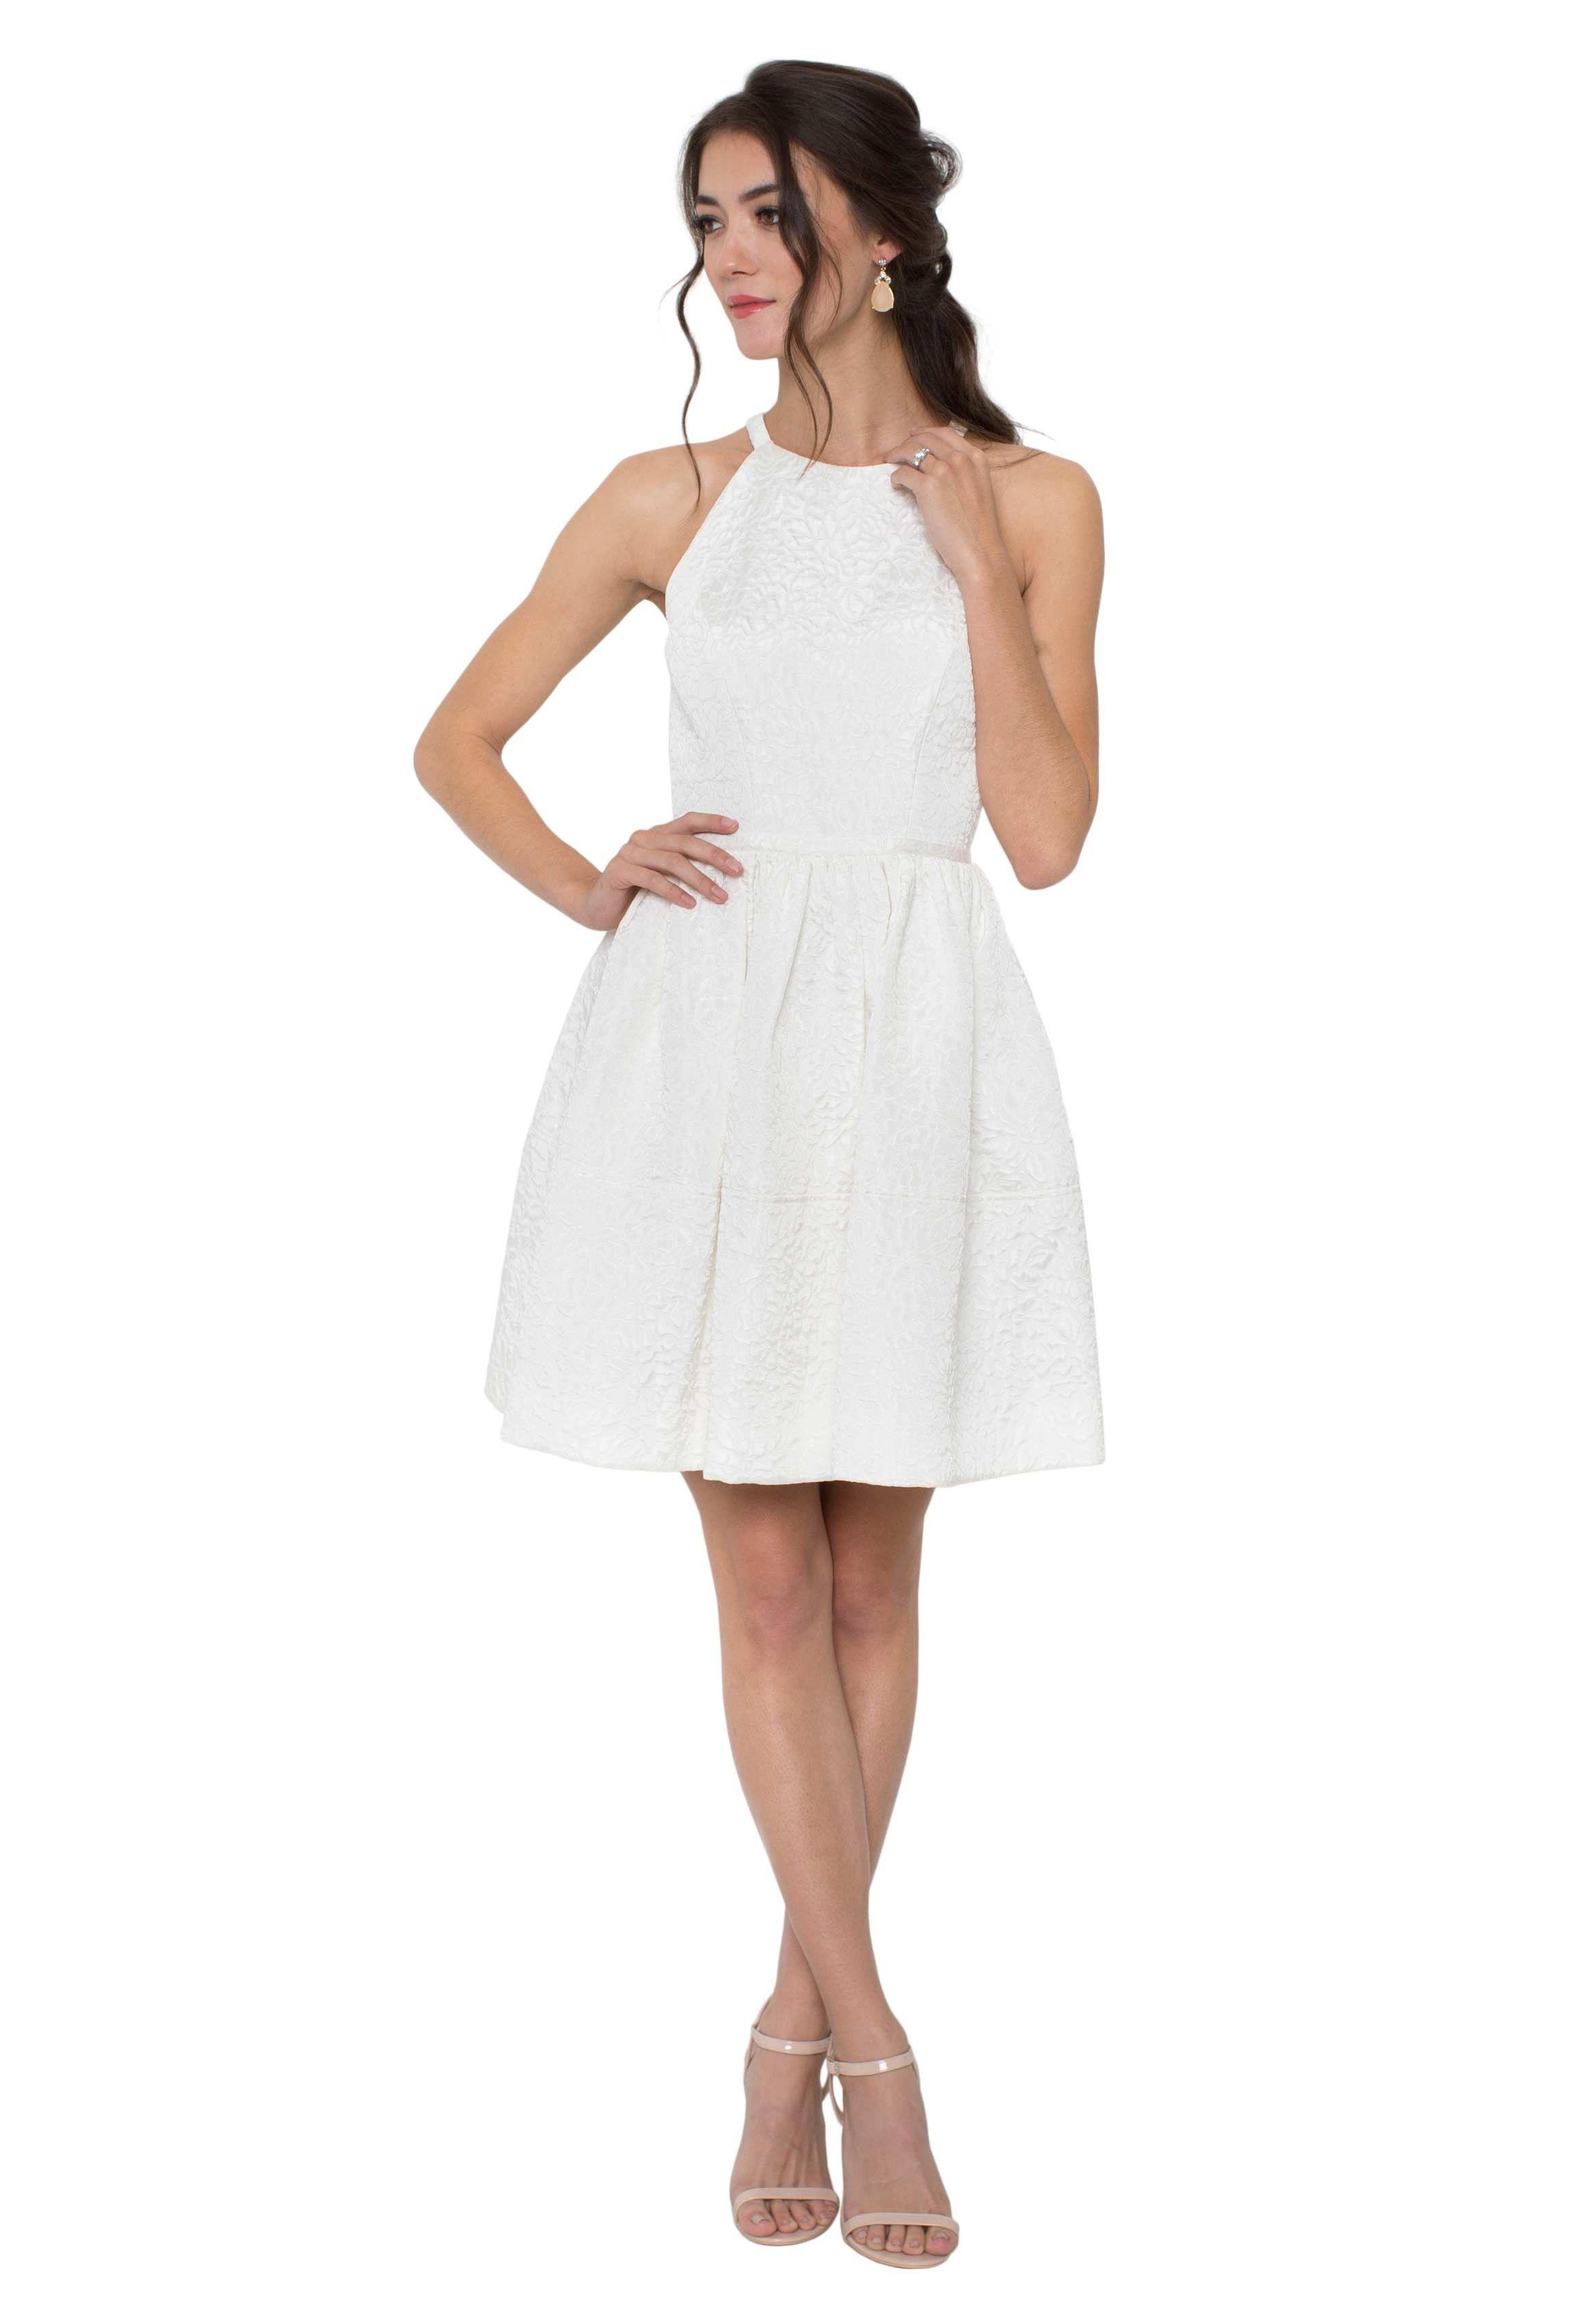 Pin By Kelli Wright On Wedding White Dress White Short Dress Dresses [ 3400 x 2300 Pixel ]